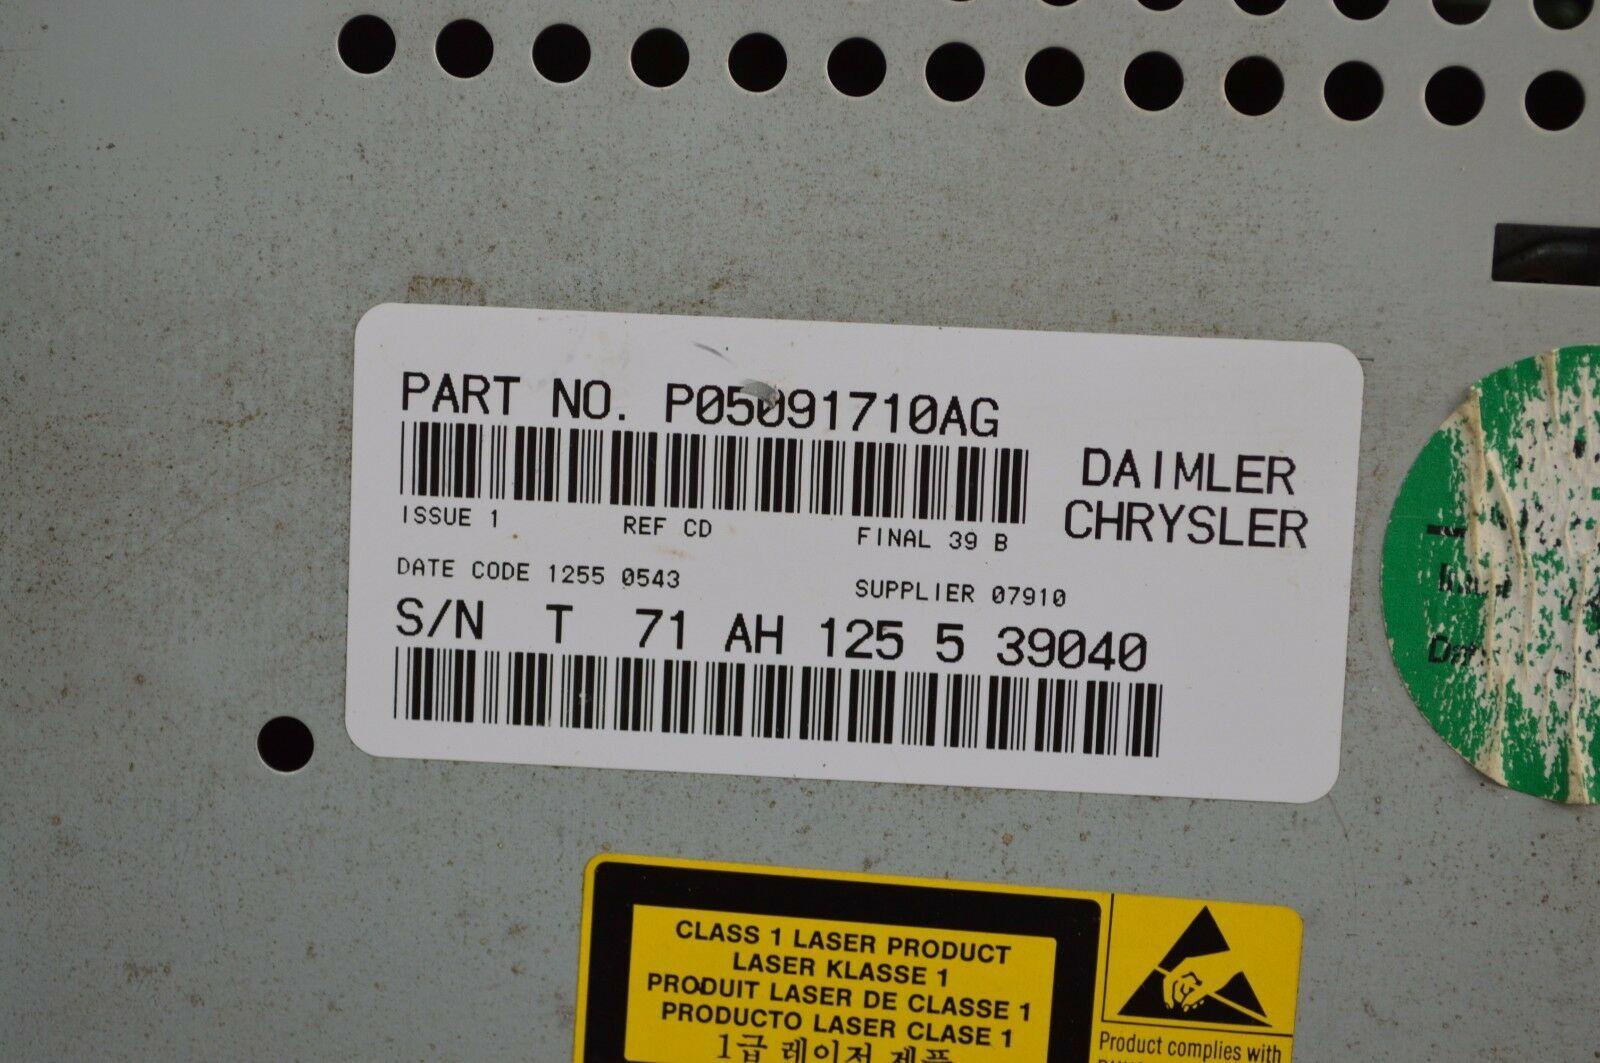 2004-2010 Chrysler Dodge Jeep Radio Cd MP3 AUX IPOD TESTED P05091710AG N49#019 image 6